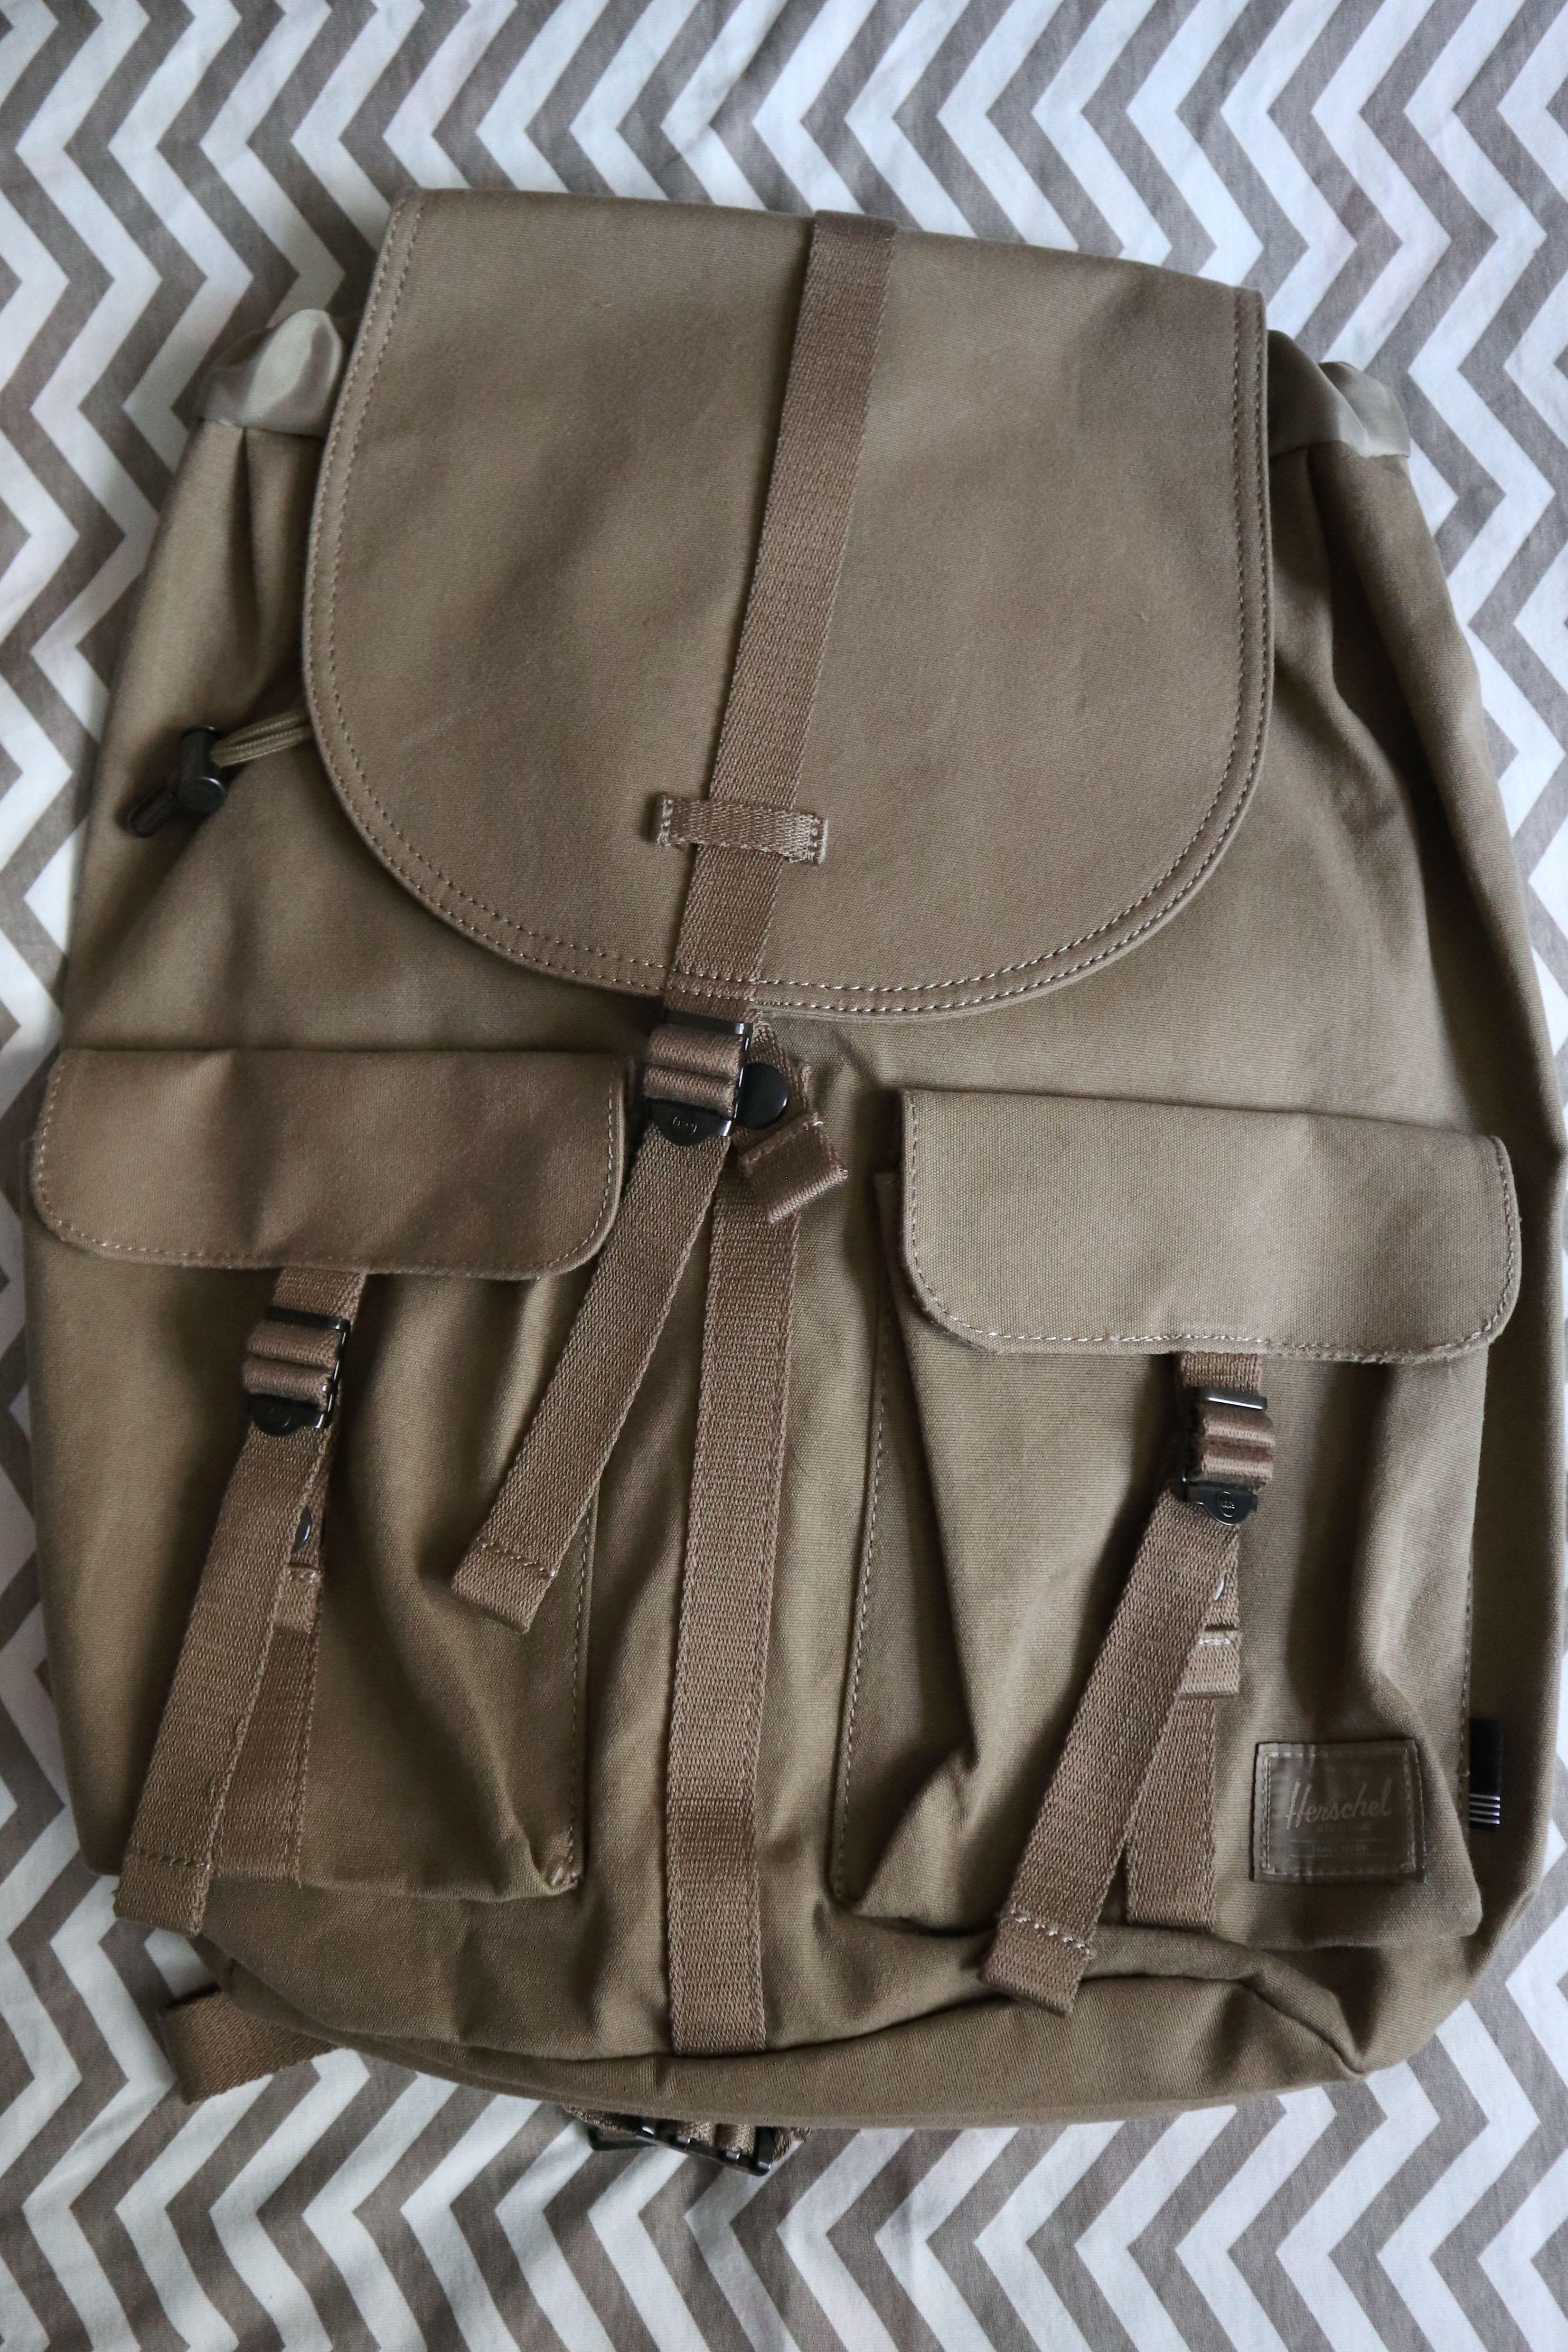 Herschel Dawson Backpack, Women s Fashion, Bags   Wallets on Carousell 7680ff1f05